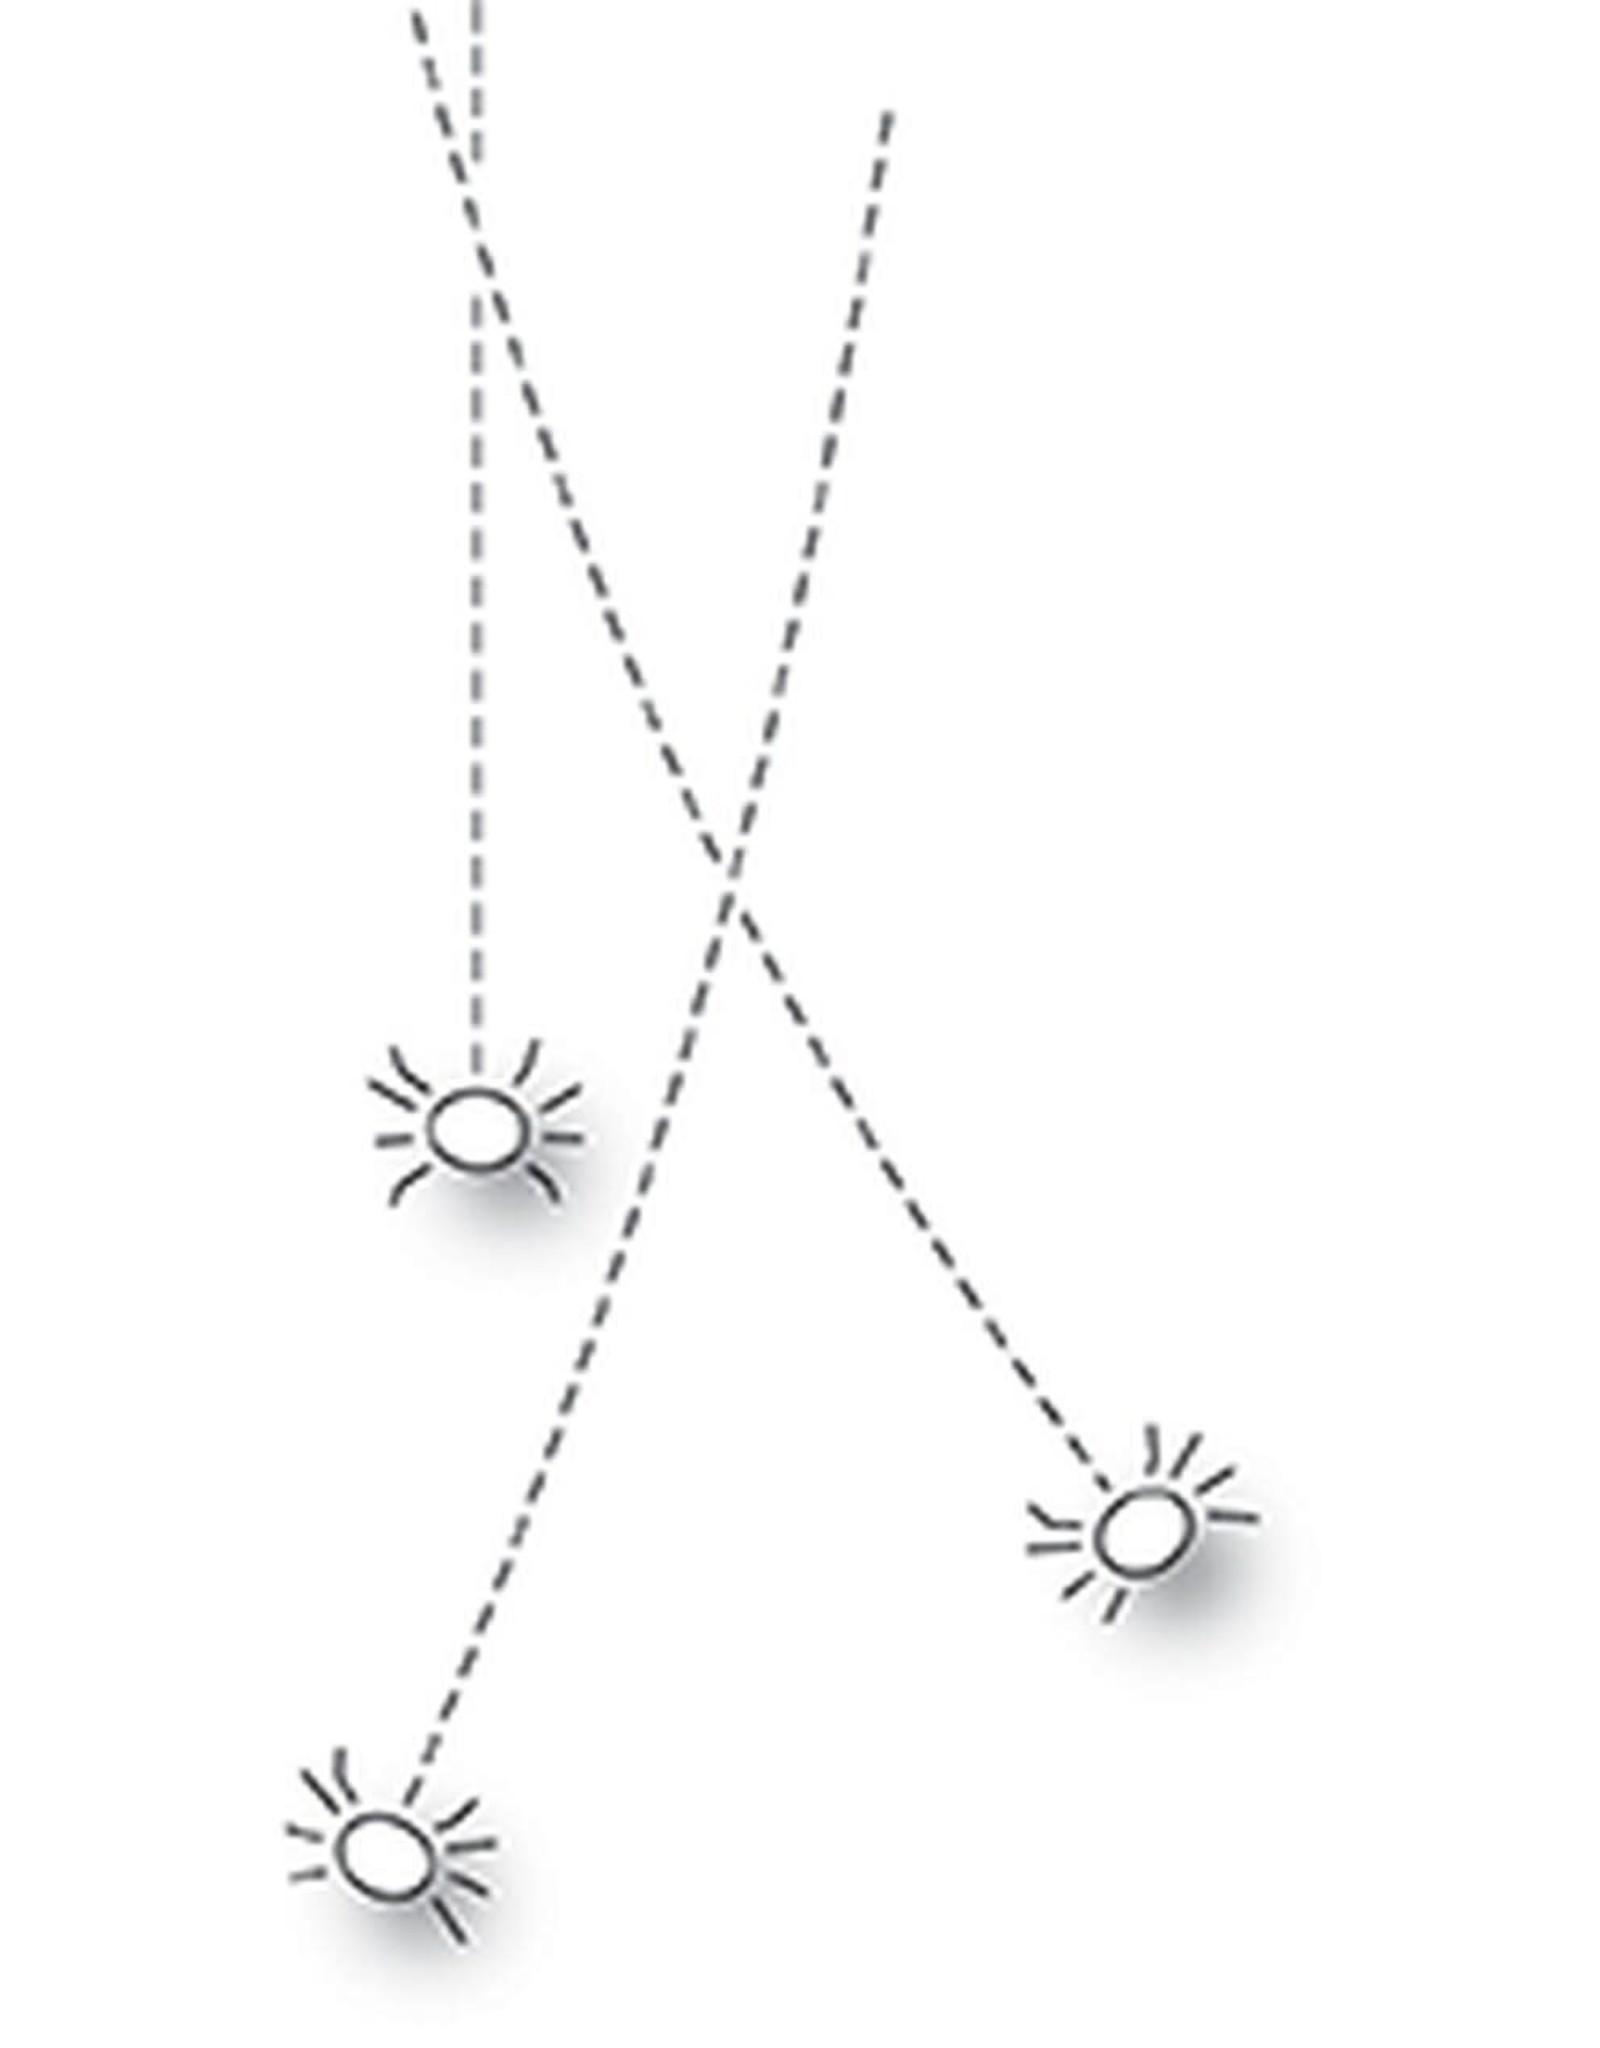 Poppystamps, Inc. Dangling Spiders (Poppy) (RETIRED) (25%)